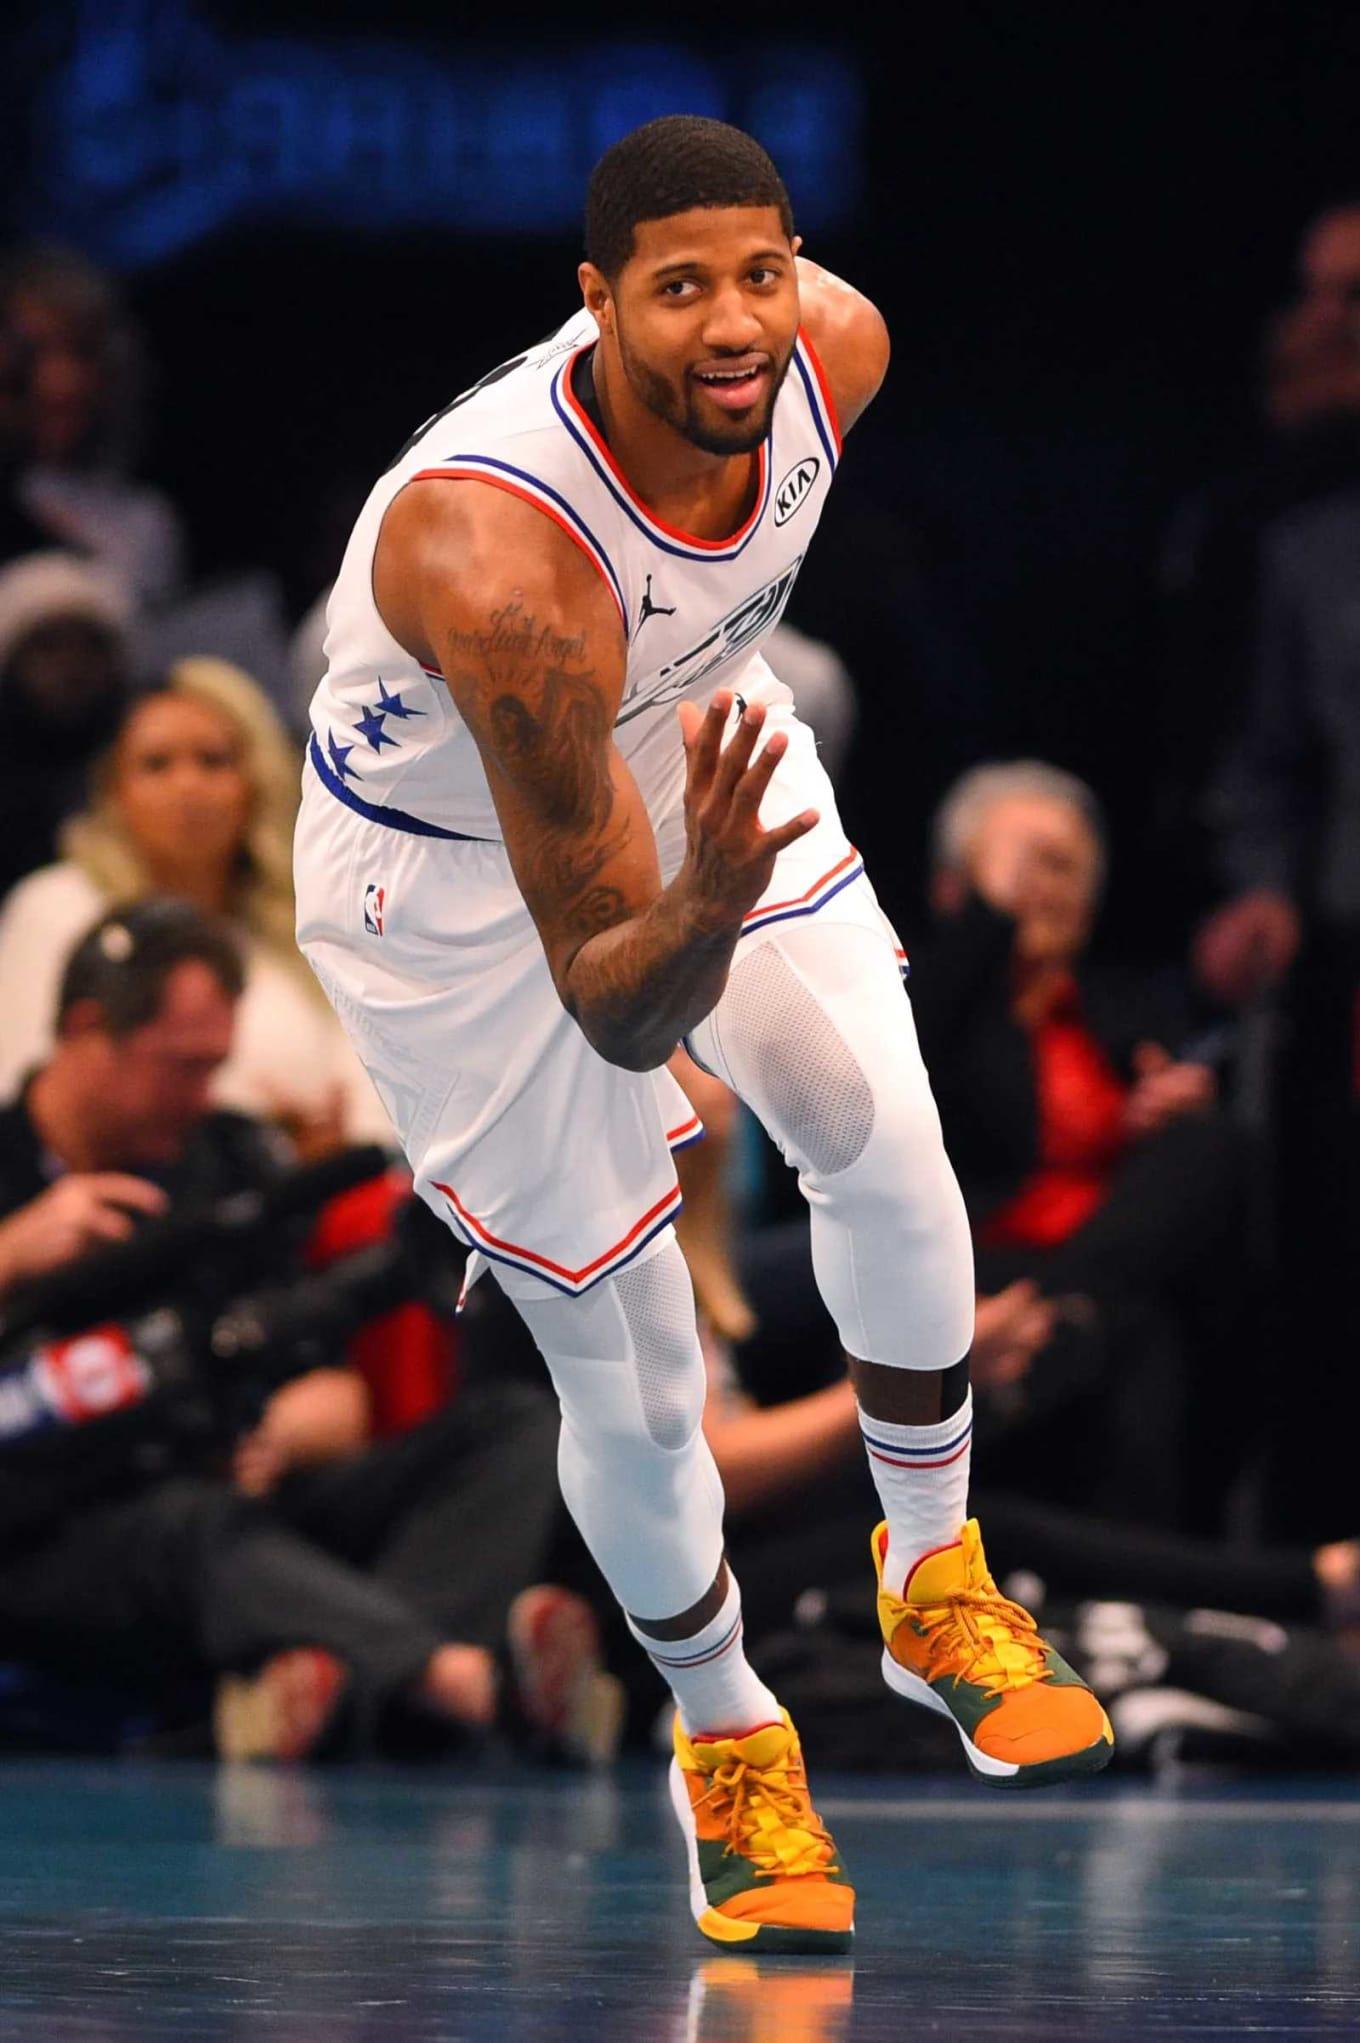 c2e3878e9585 NBA All-Star Sneakers 2019